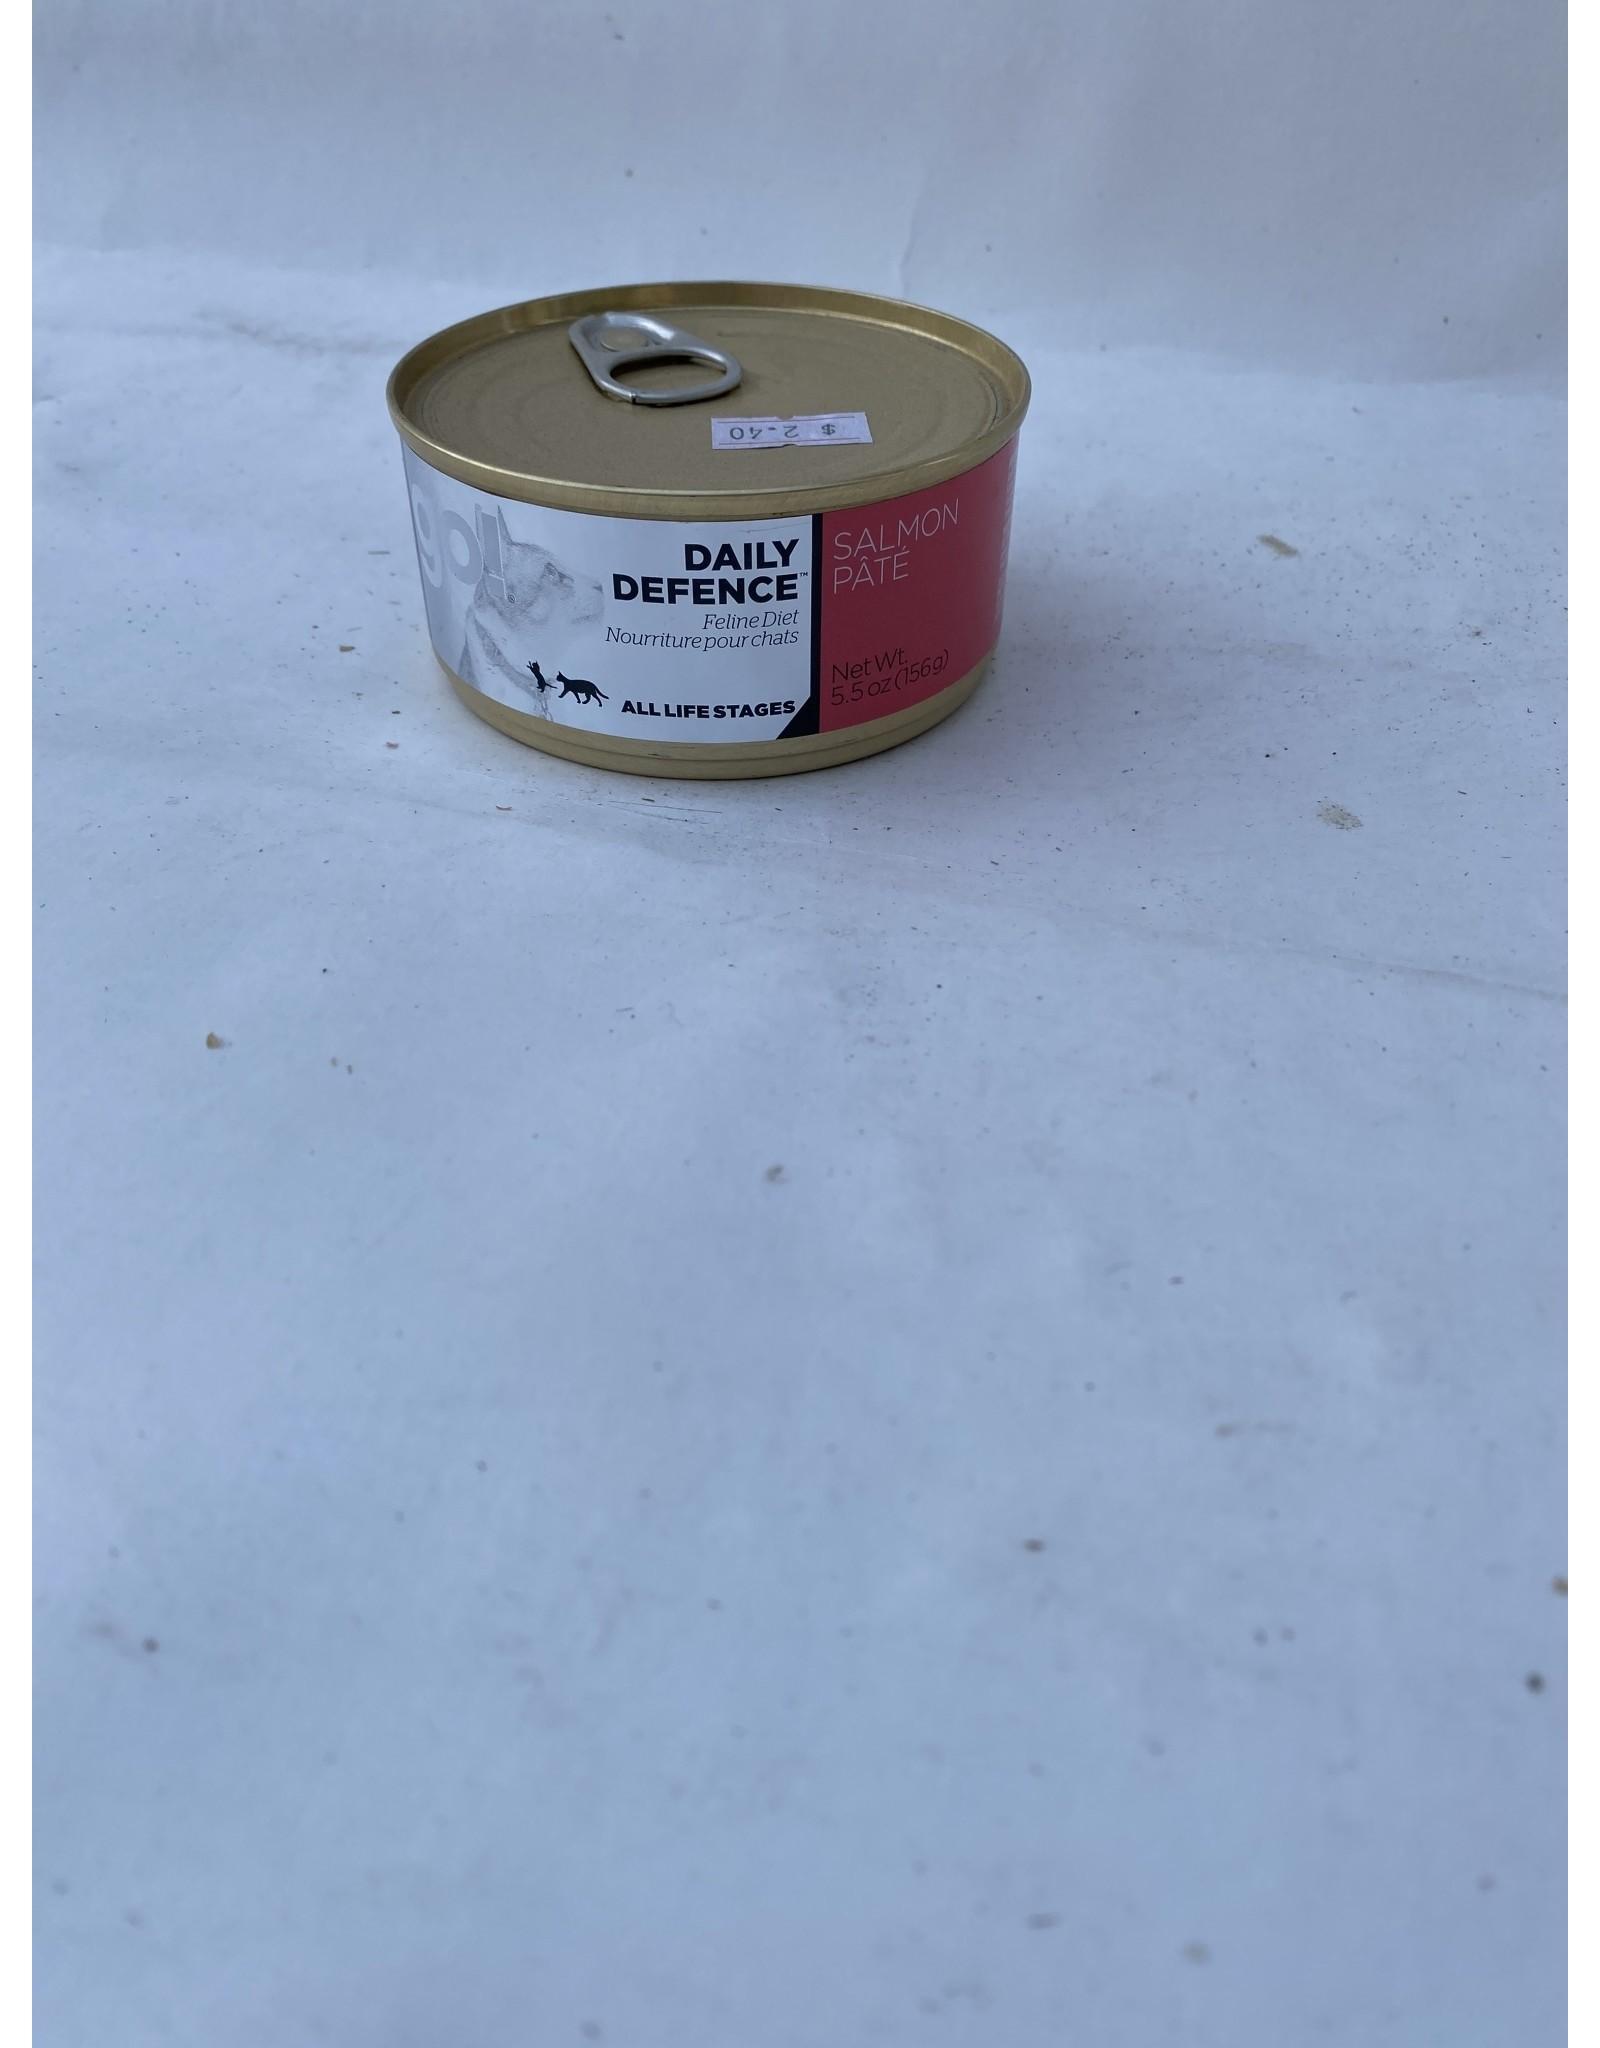 Petcurean GO! Daily Defence Salmon Pate [CAT] 5.5OZ